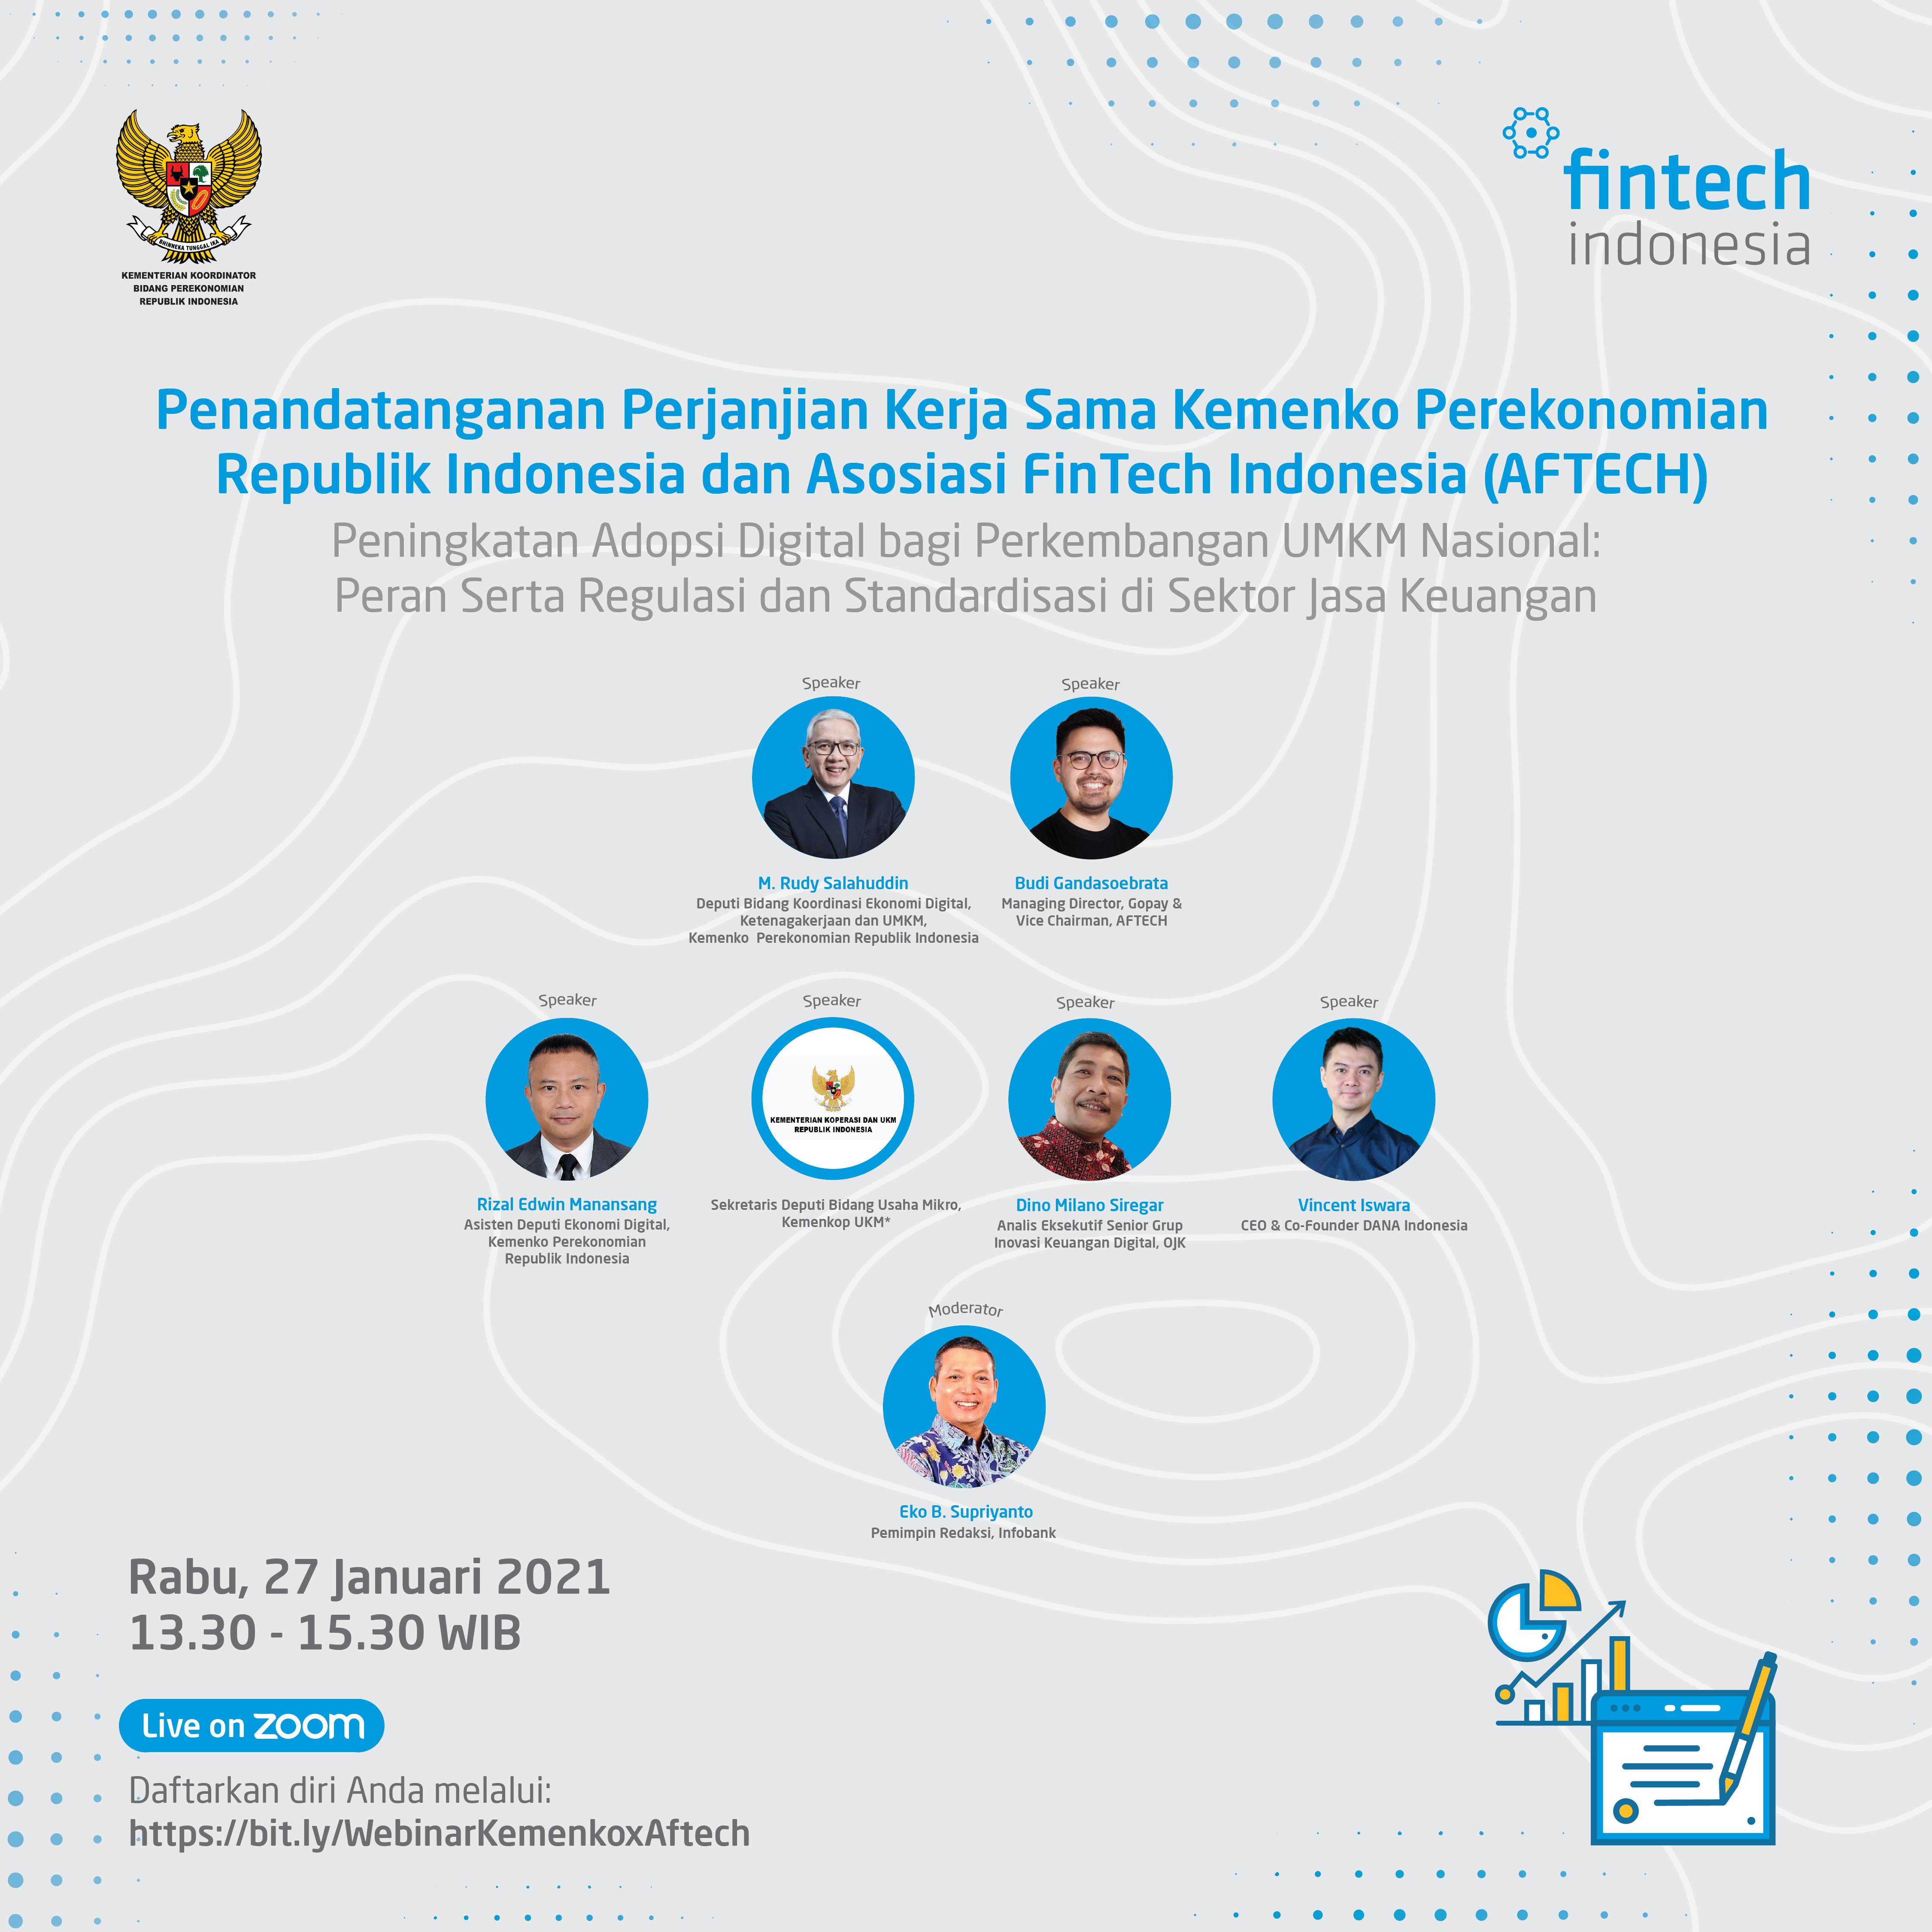 Fintech Indonesia